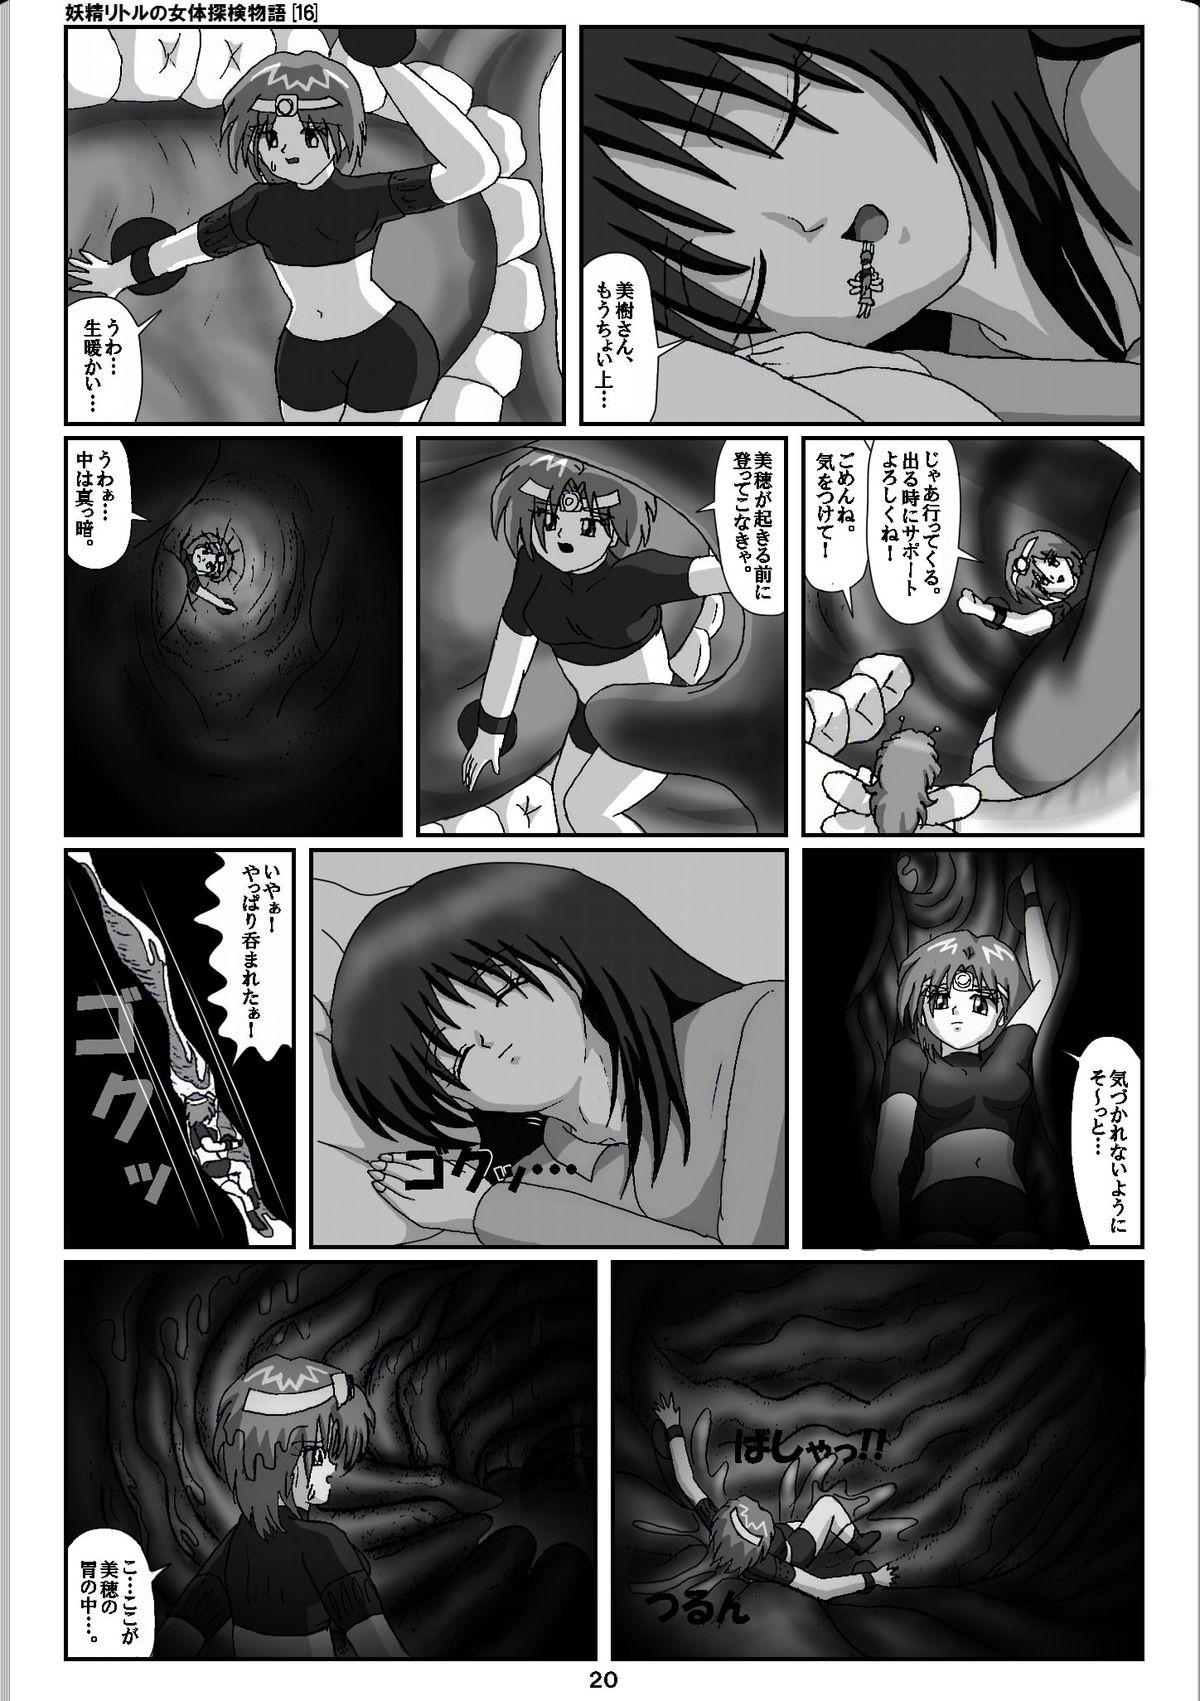 Yousei Little no Nyotai Tanken Monogatari 19